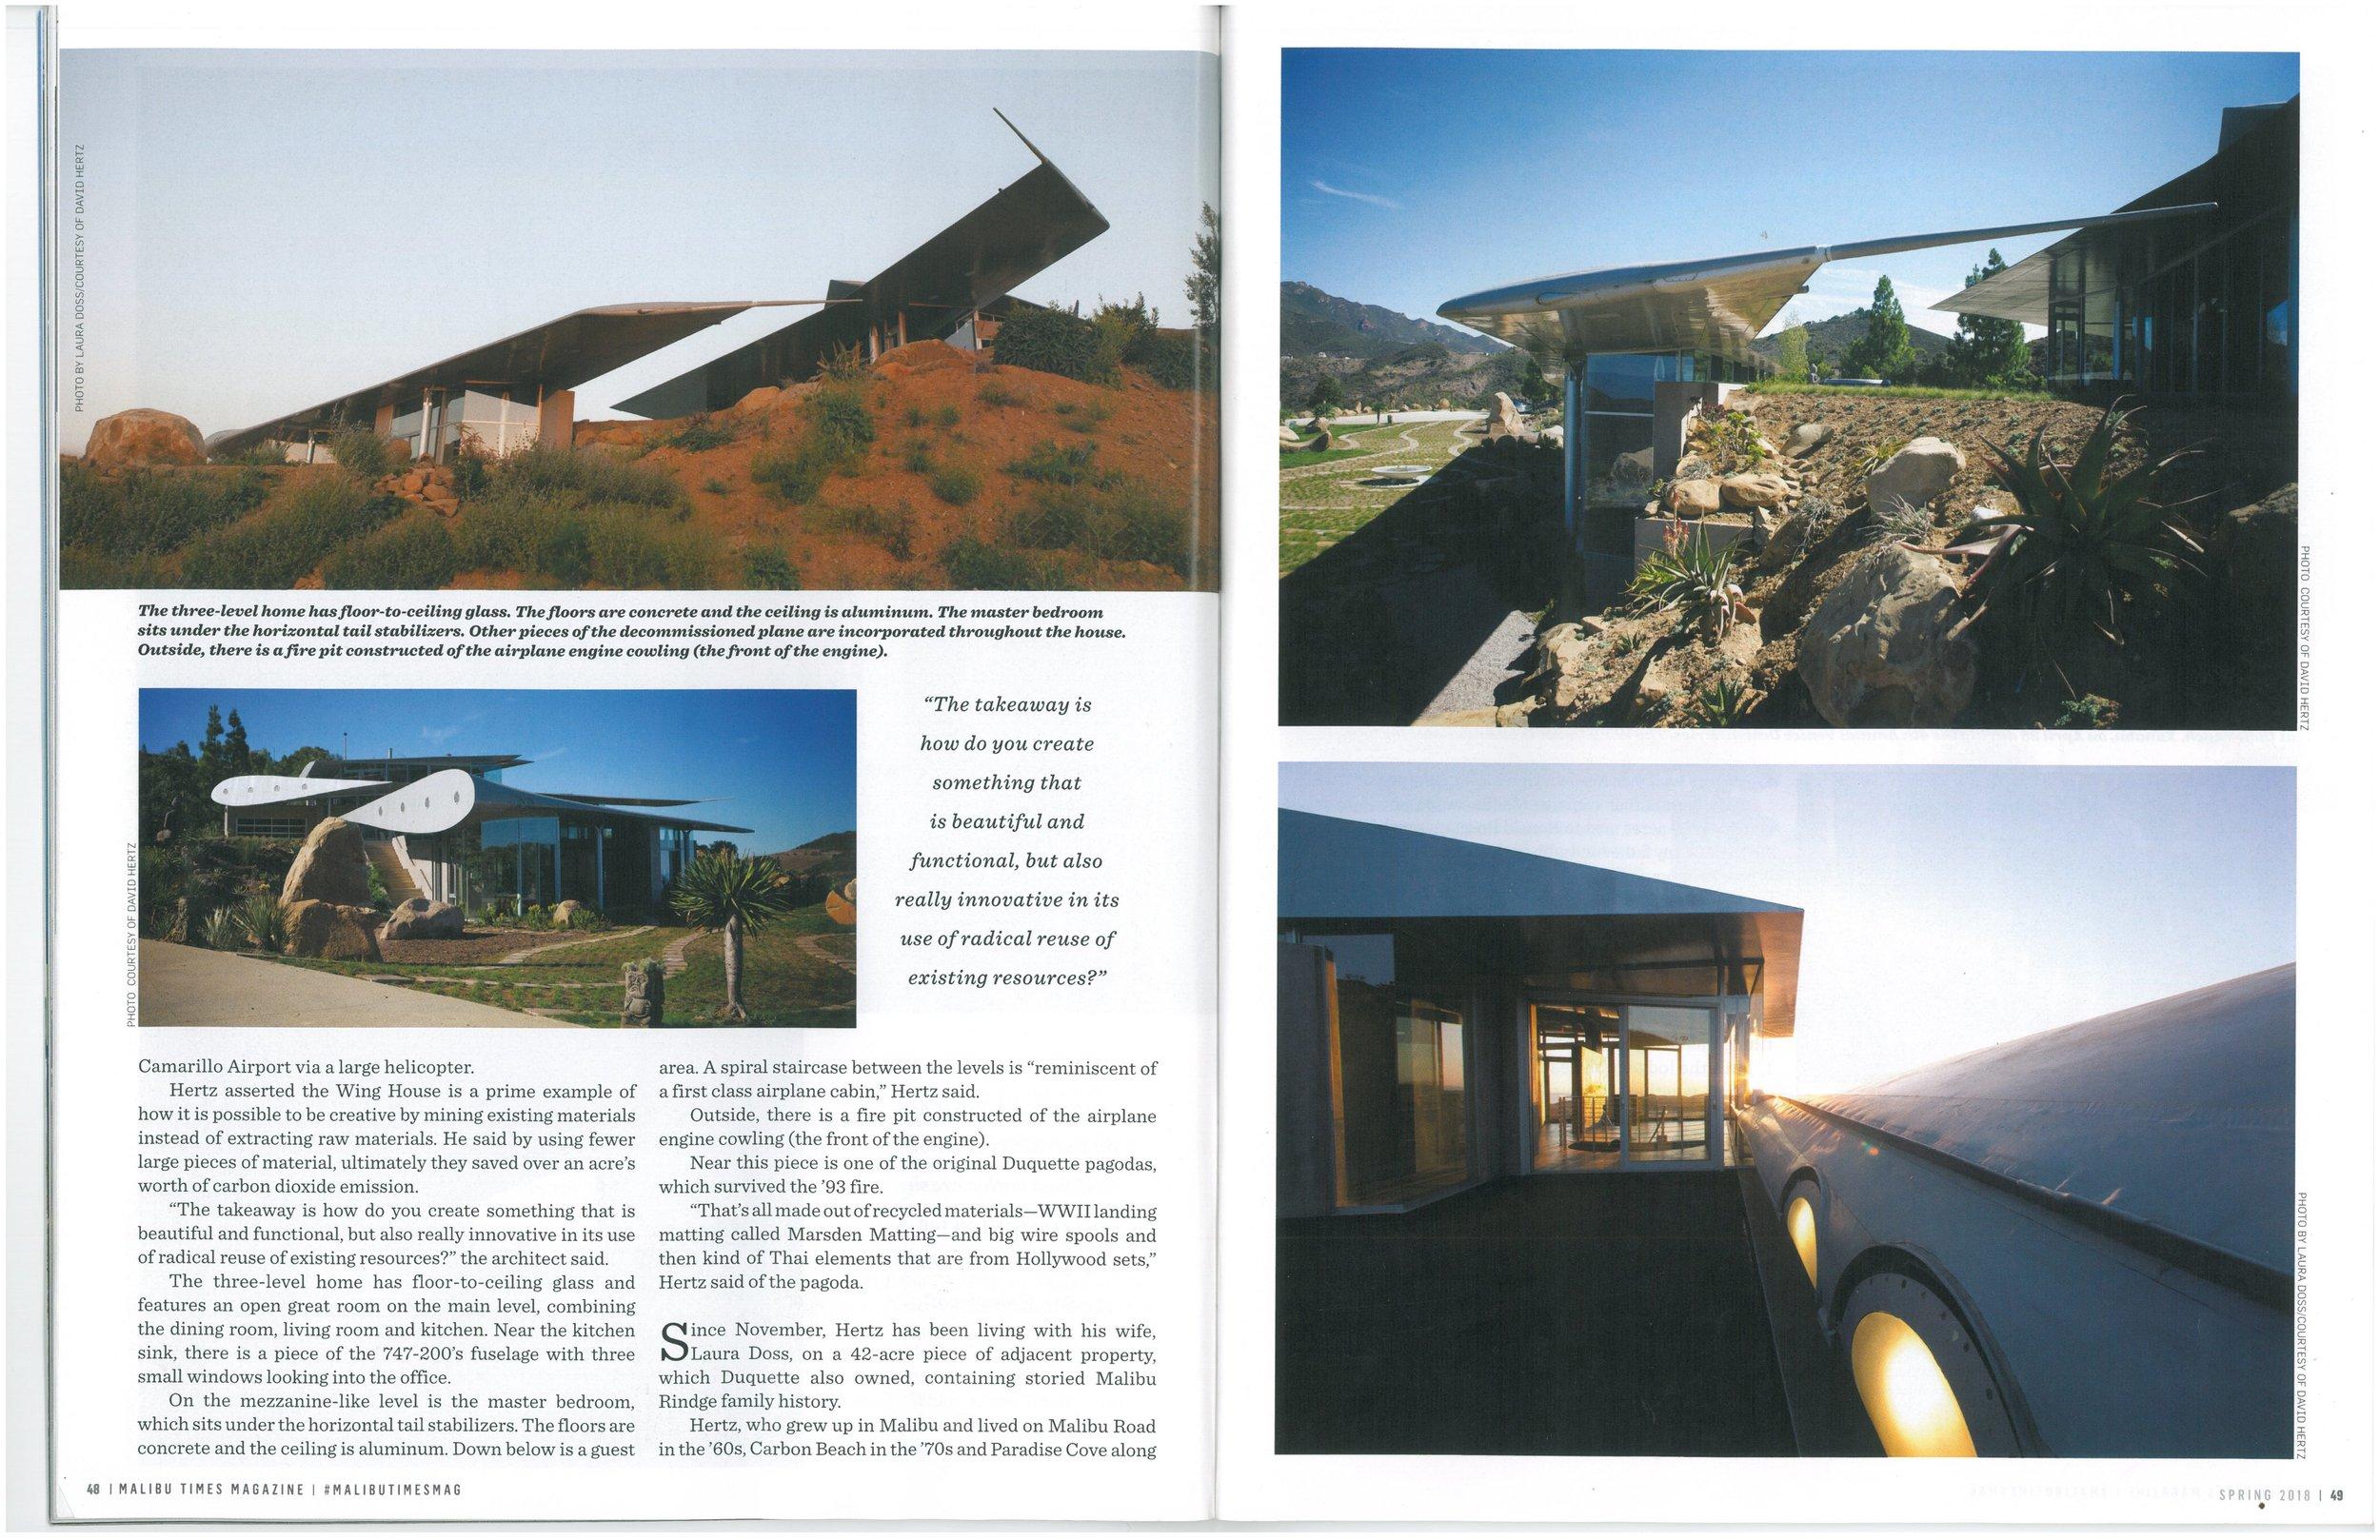 Source: Malibu Times VOL 15 - No. 1 (Print)